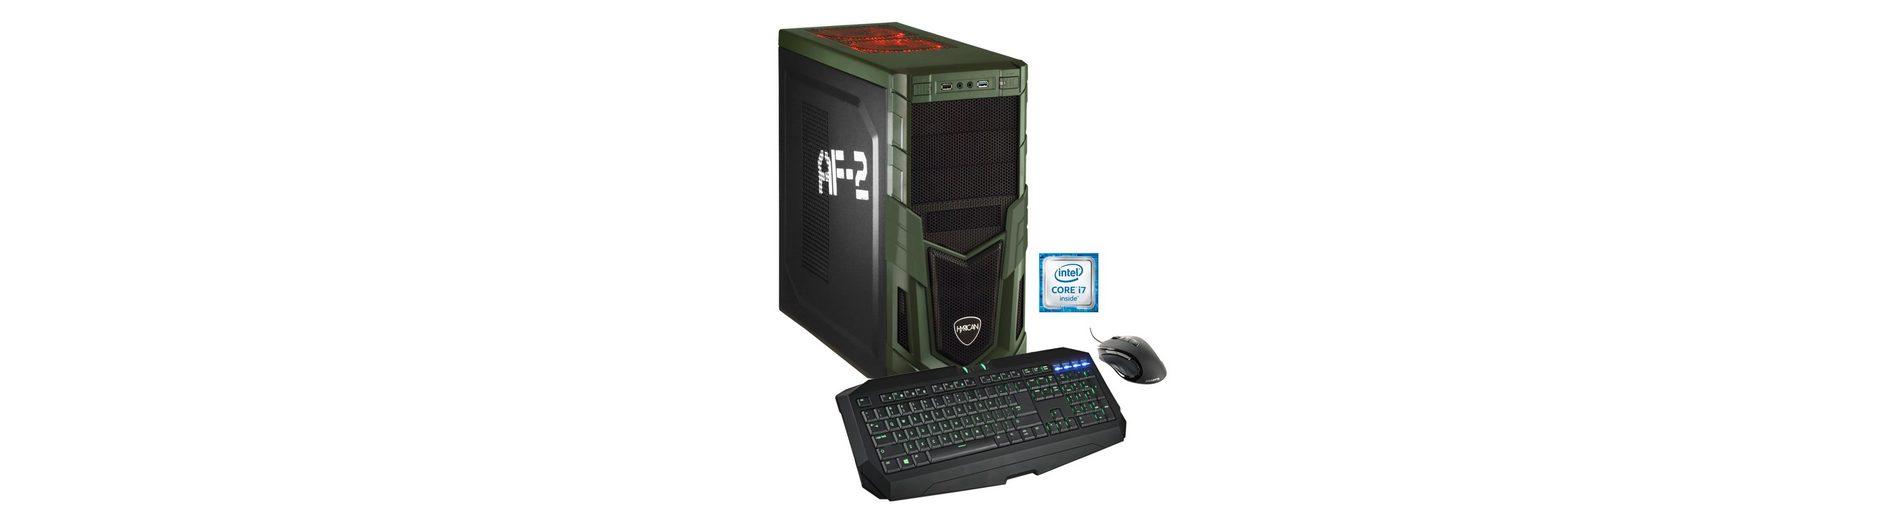 Hyrican Gaming PC Intel® i7-6700K, GeForce GTX 980Ti, Windows 10 »Military Gaming 4785 OC Edition«